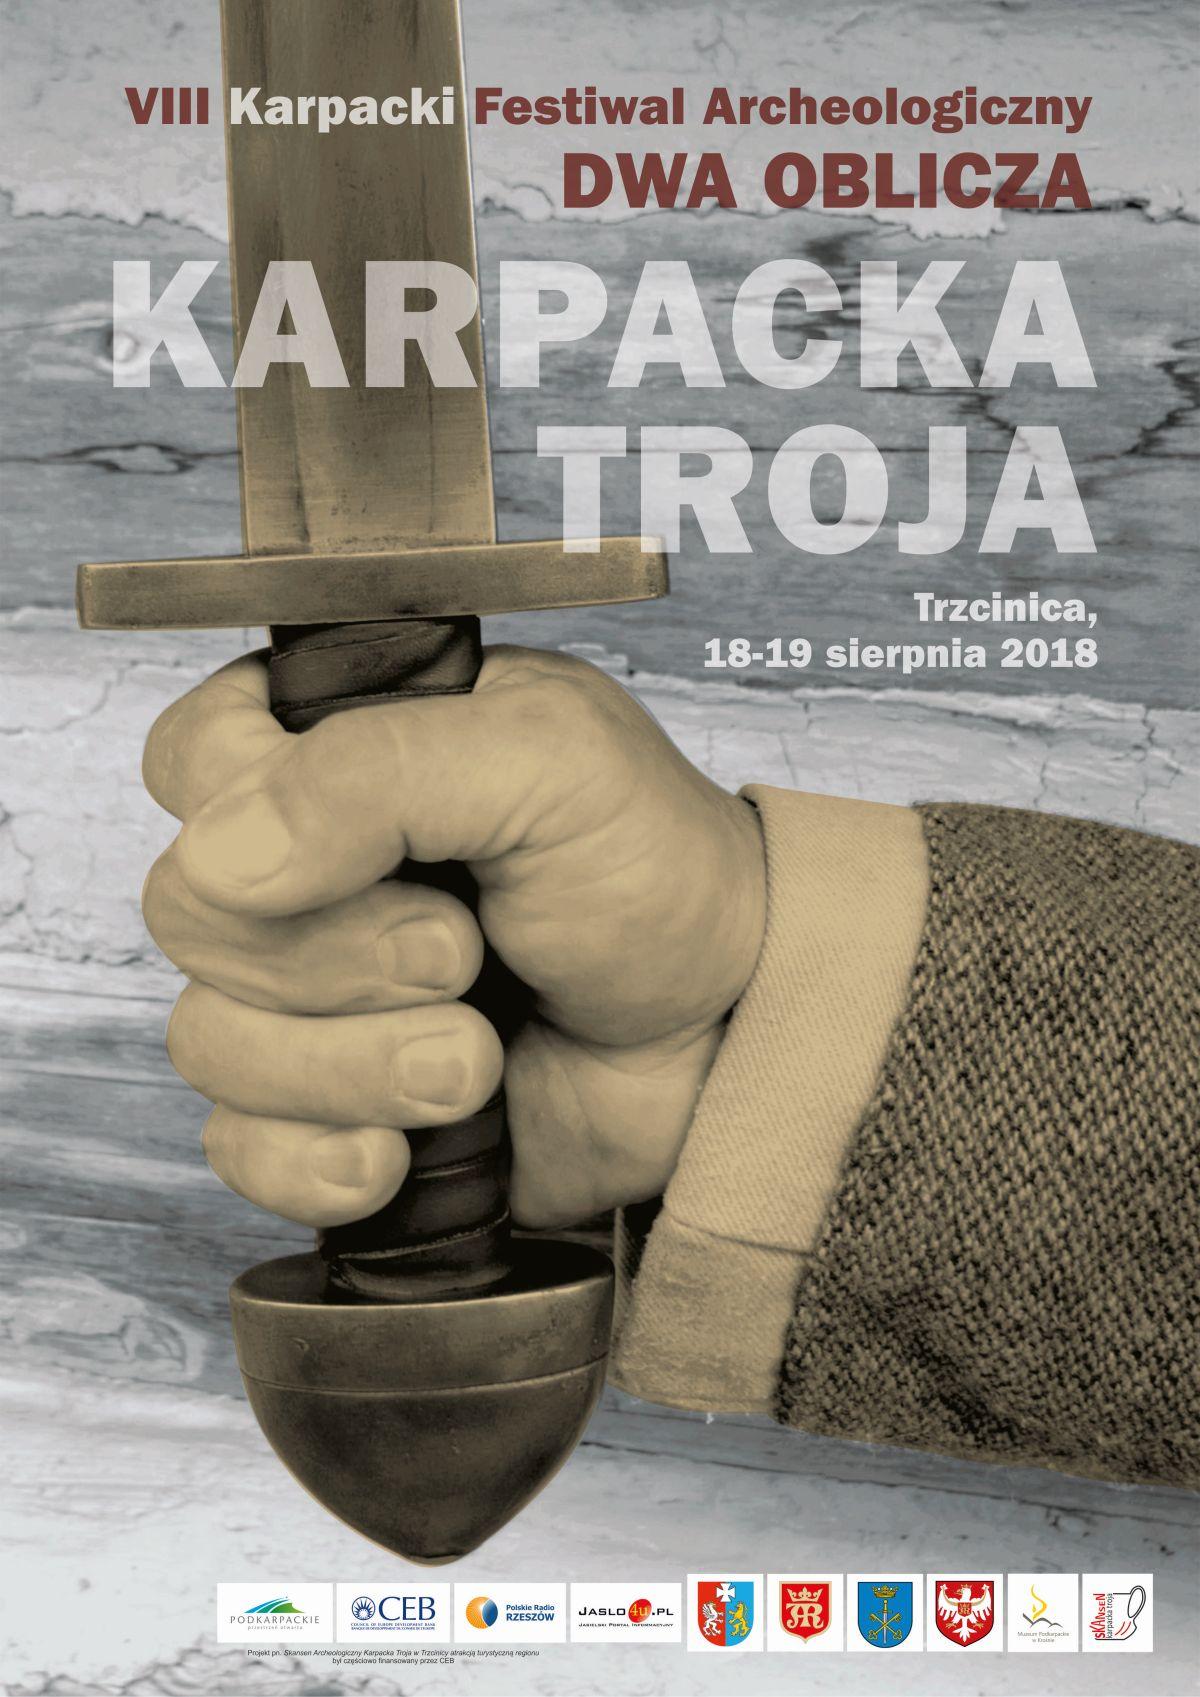 plakat festiwal 2018